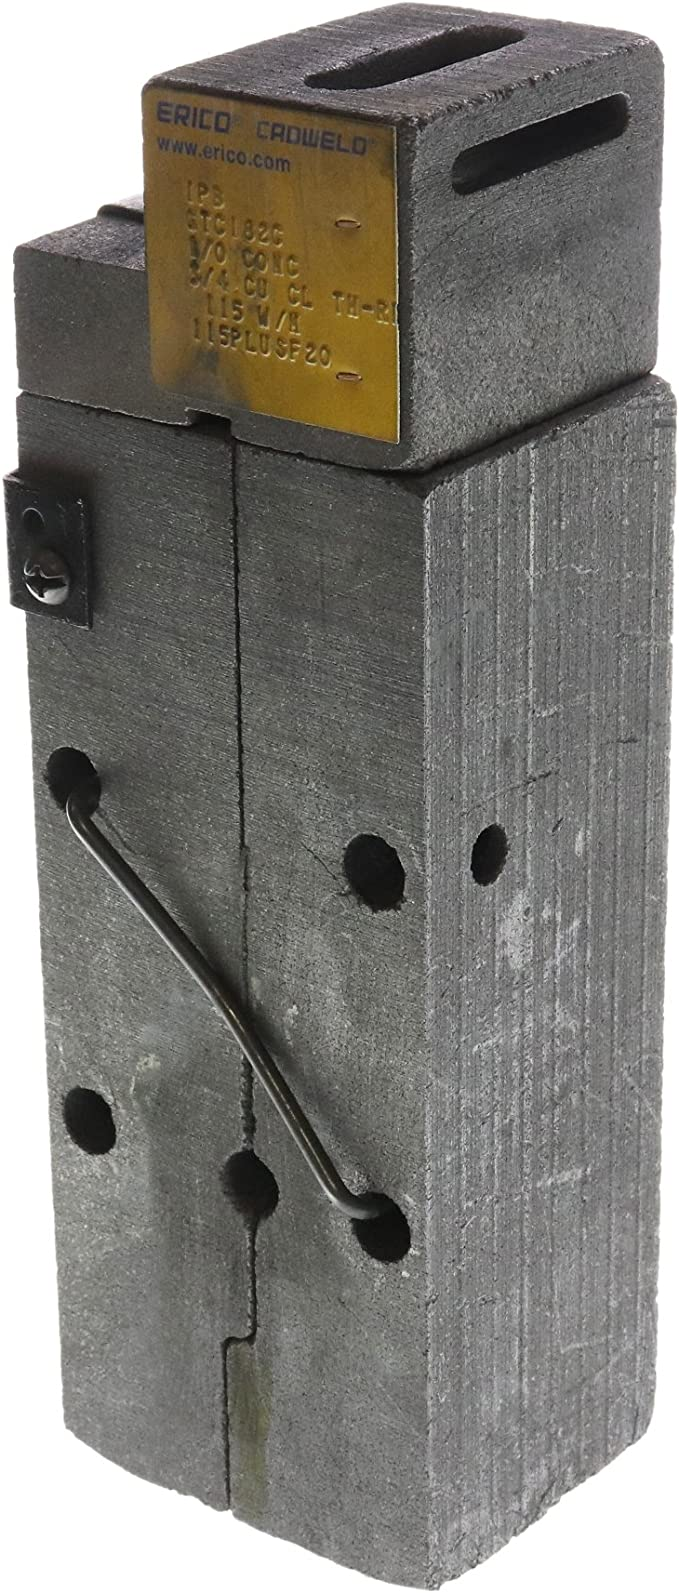 Erico Cadweld GTC-182C Mold